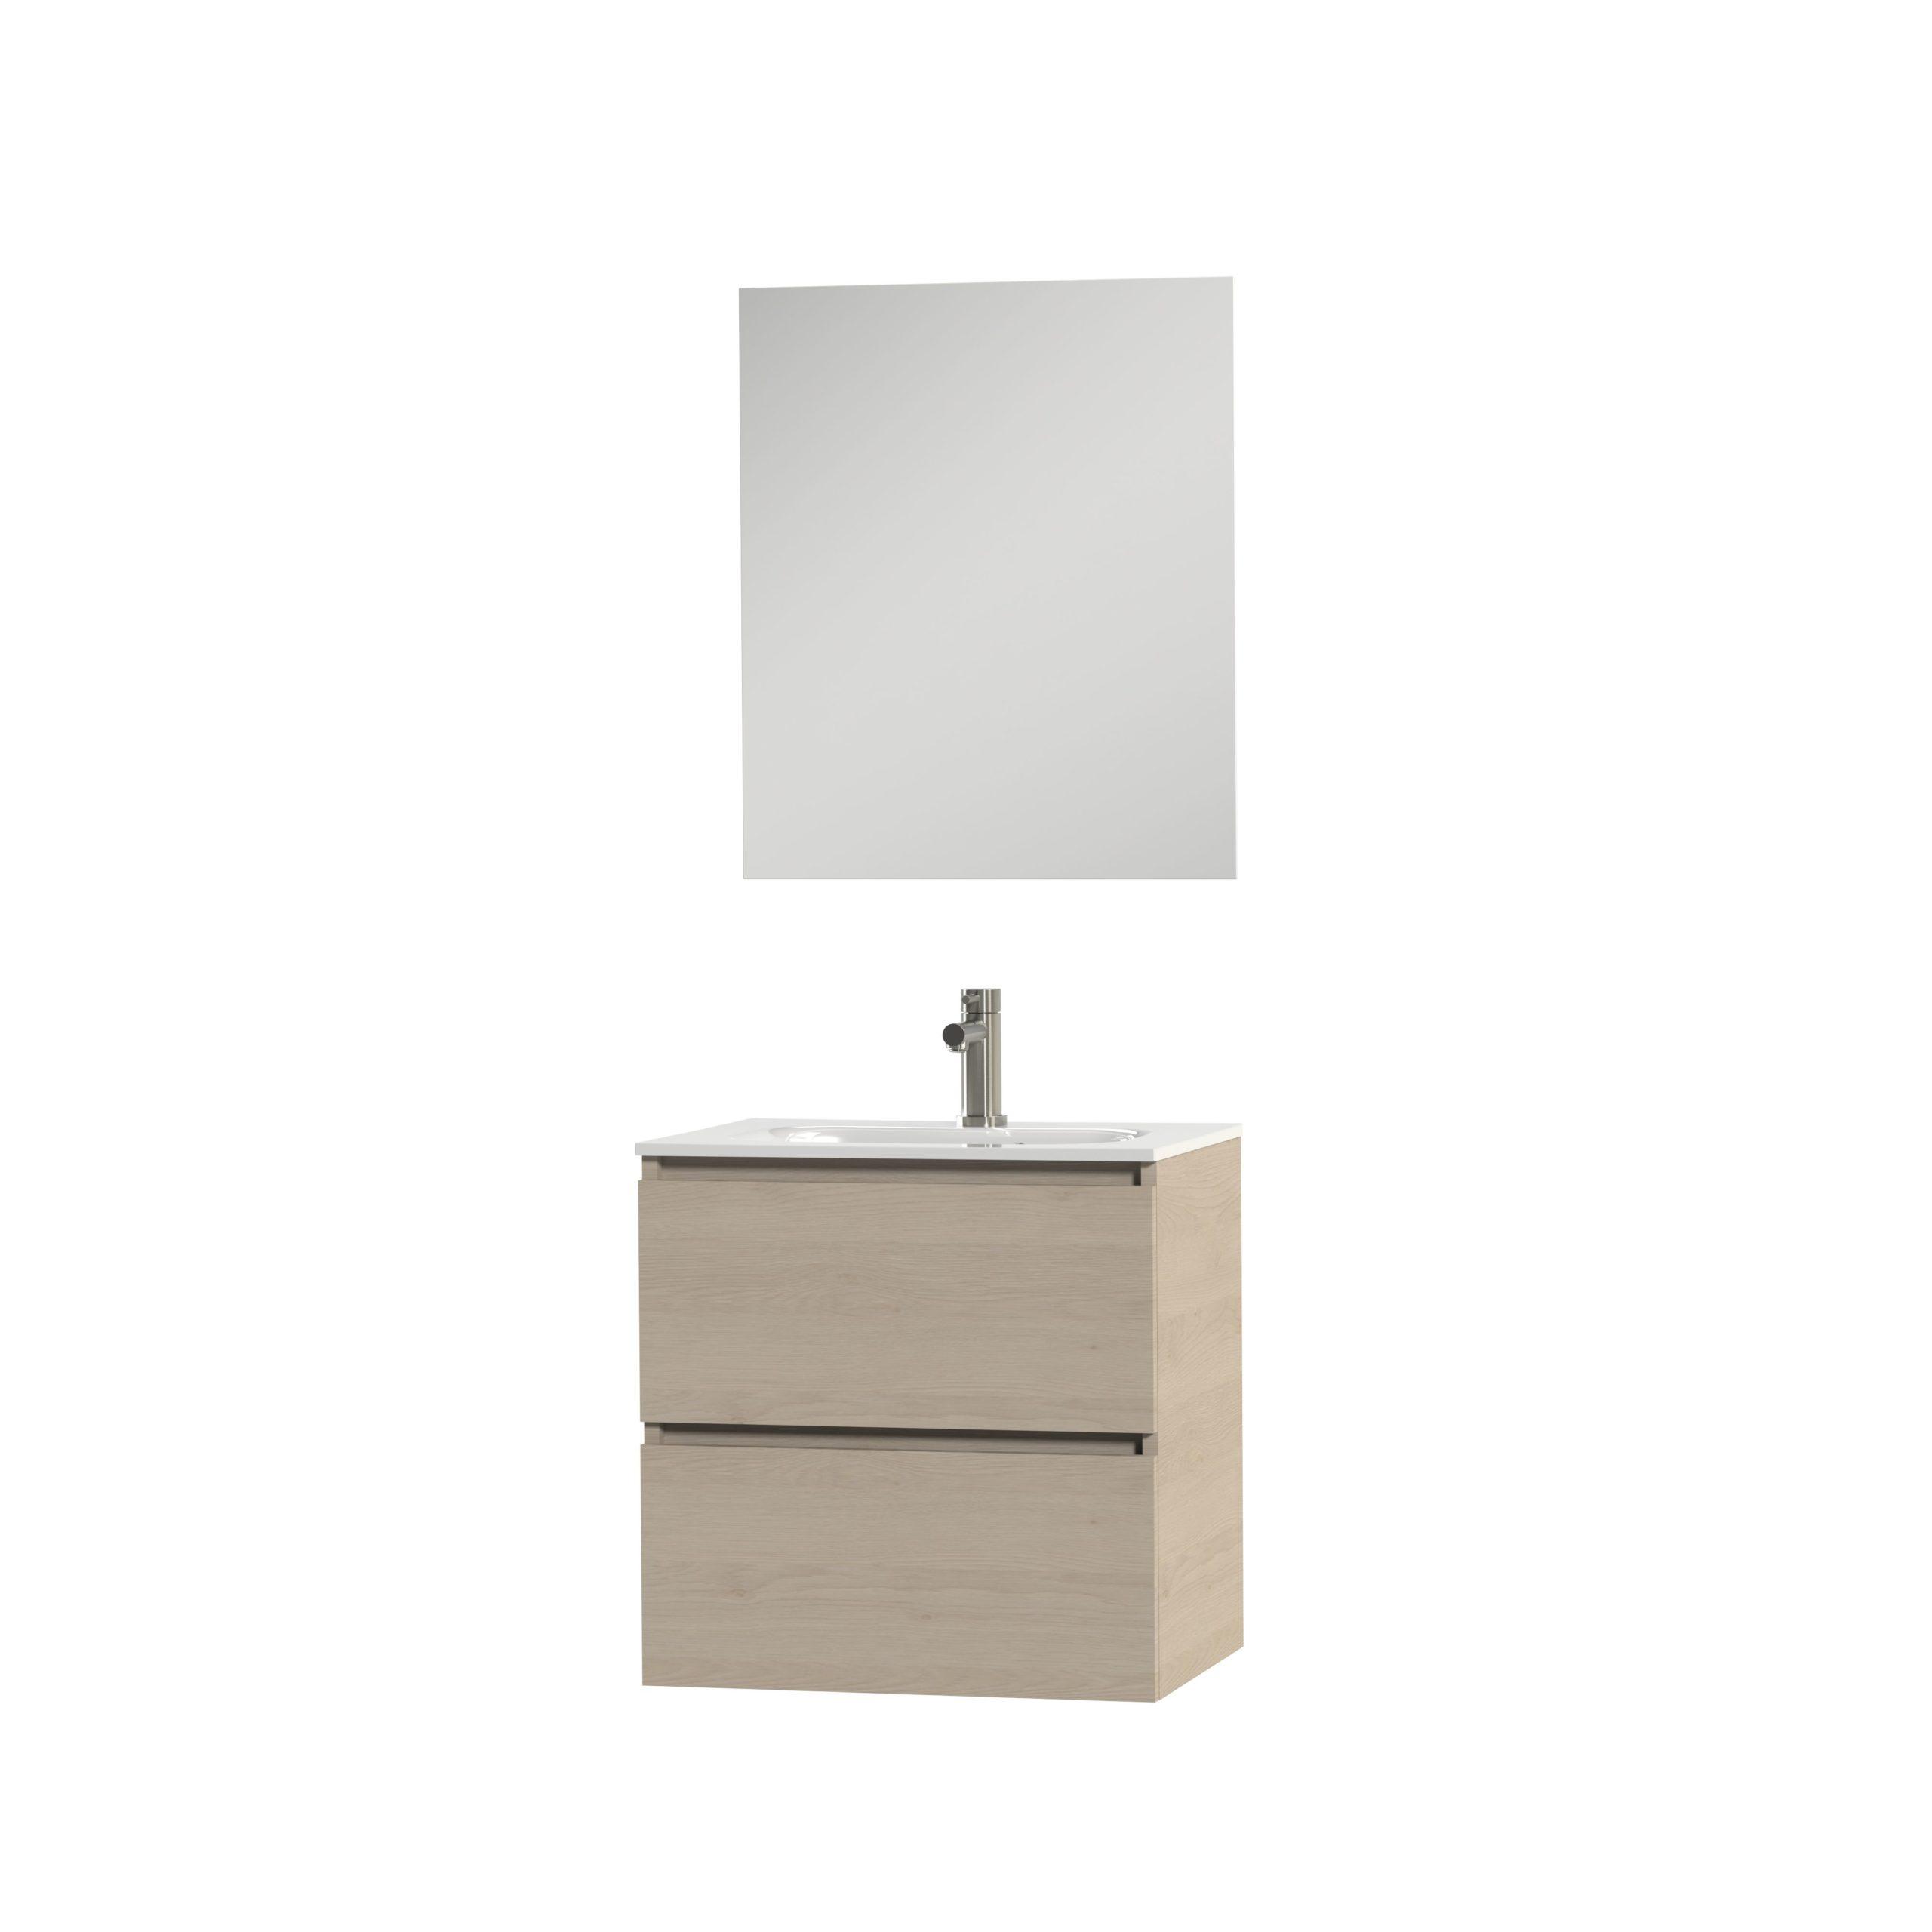 Tiger Loft badmeubel met spiegel en witte wastafel 60cm naturel eiken